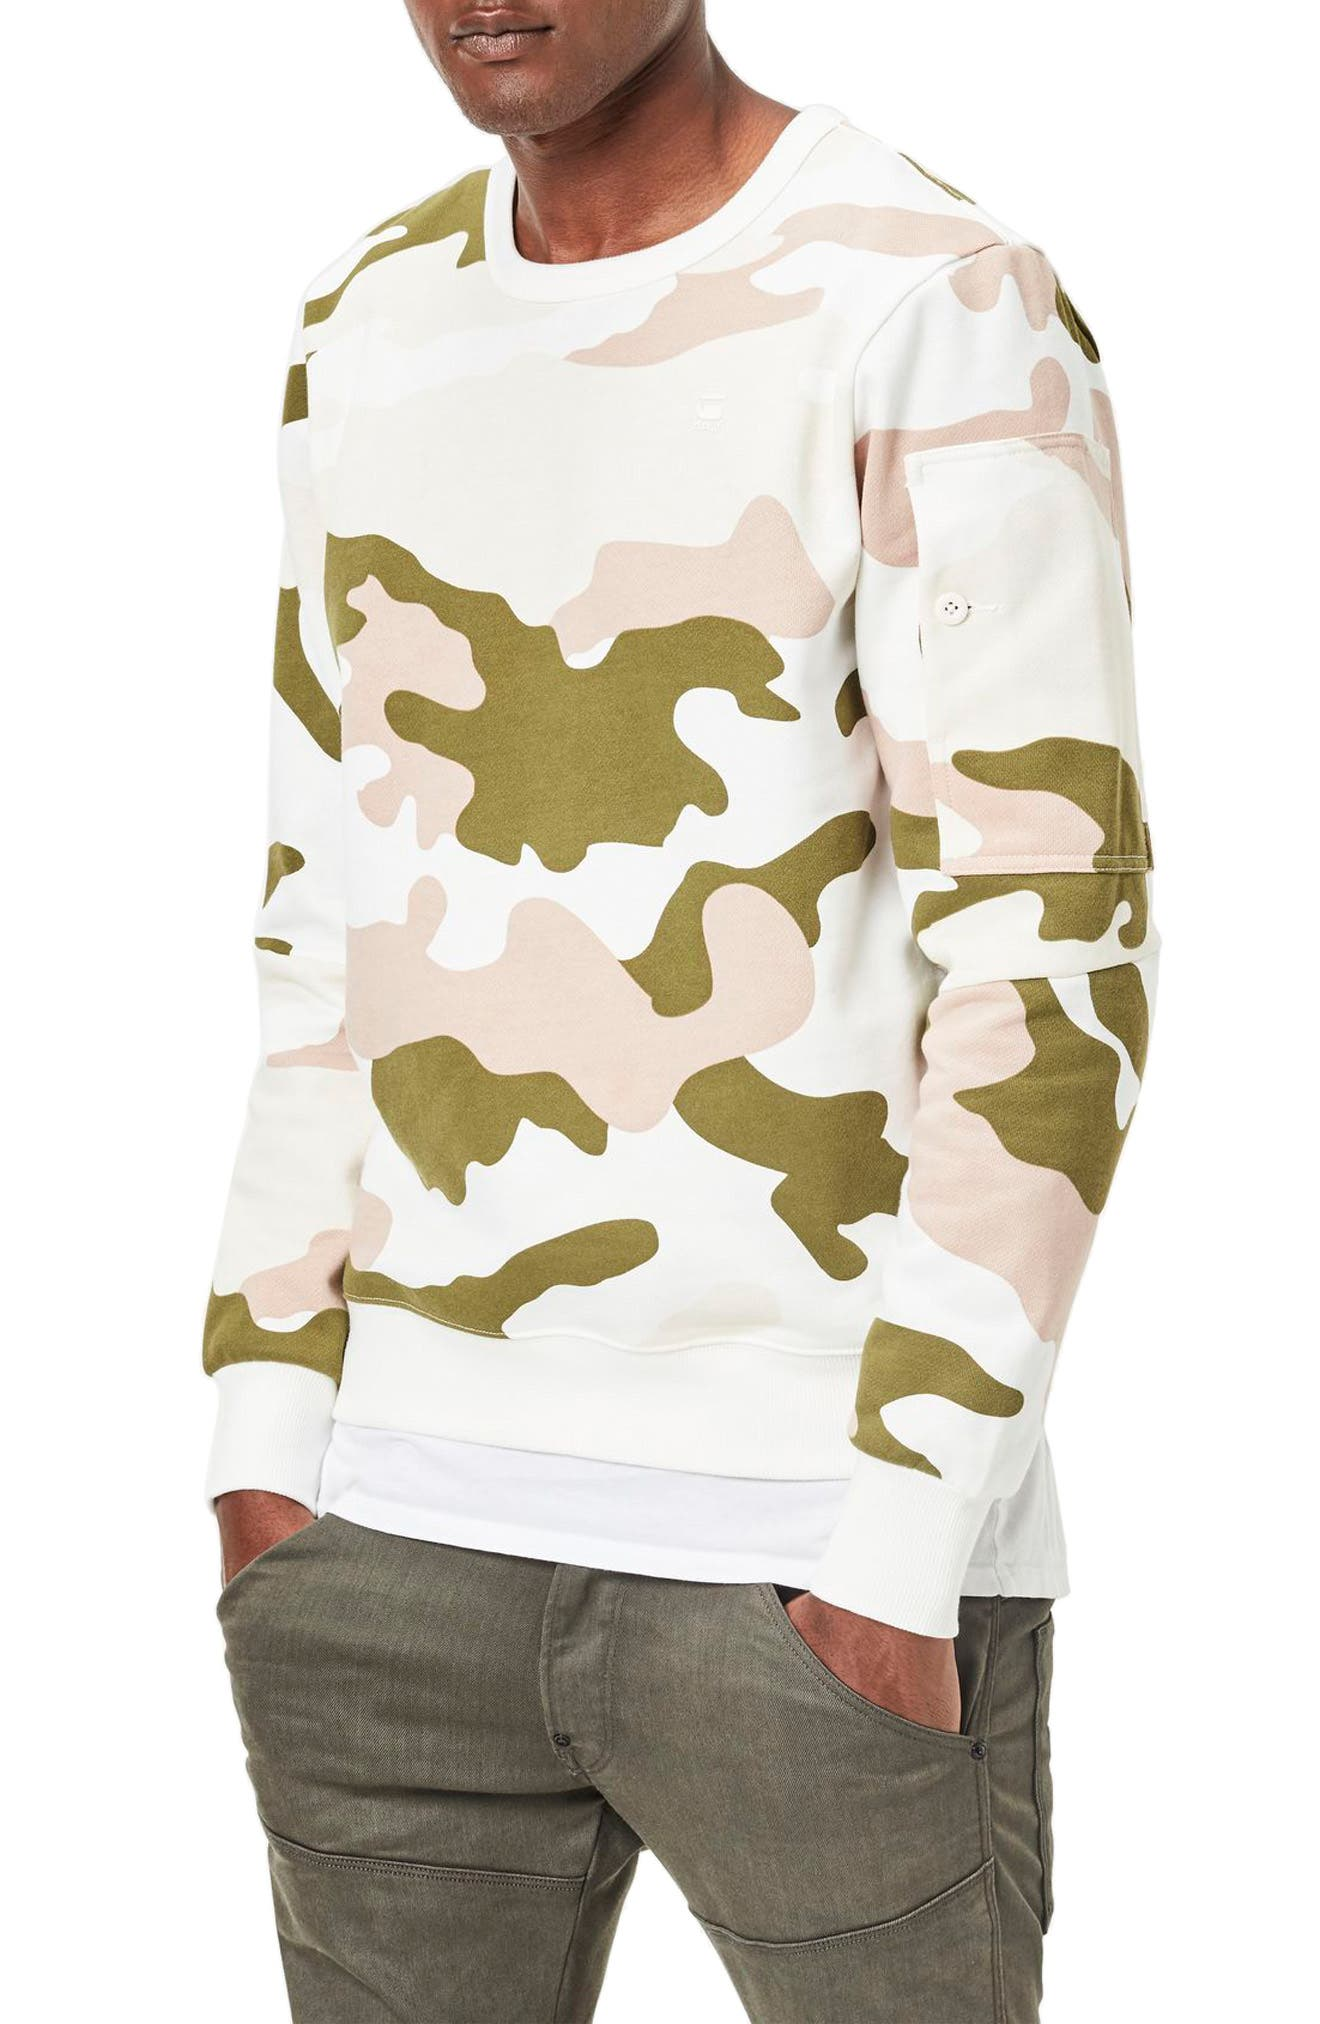 G-Star Raw Stalt Camo Sweatshirt